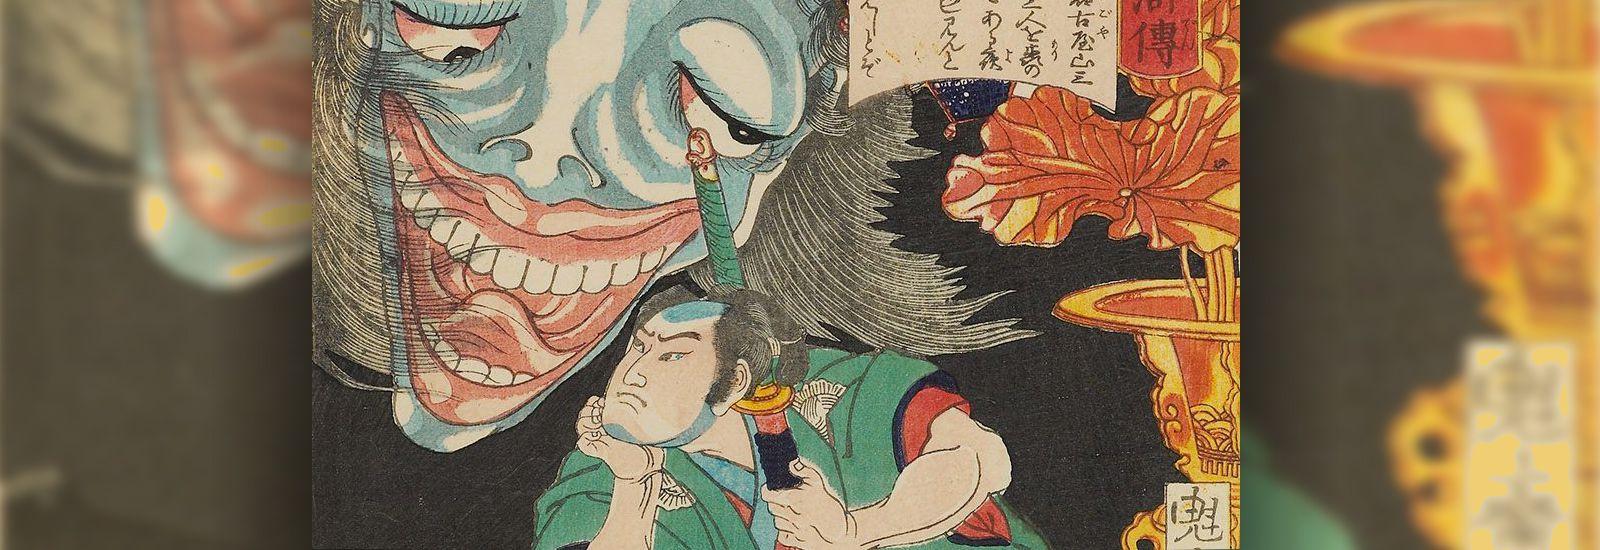 Takagi Umanosuke with a ghost